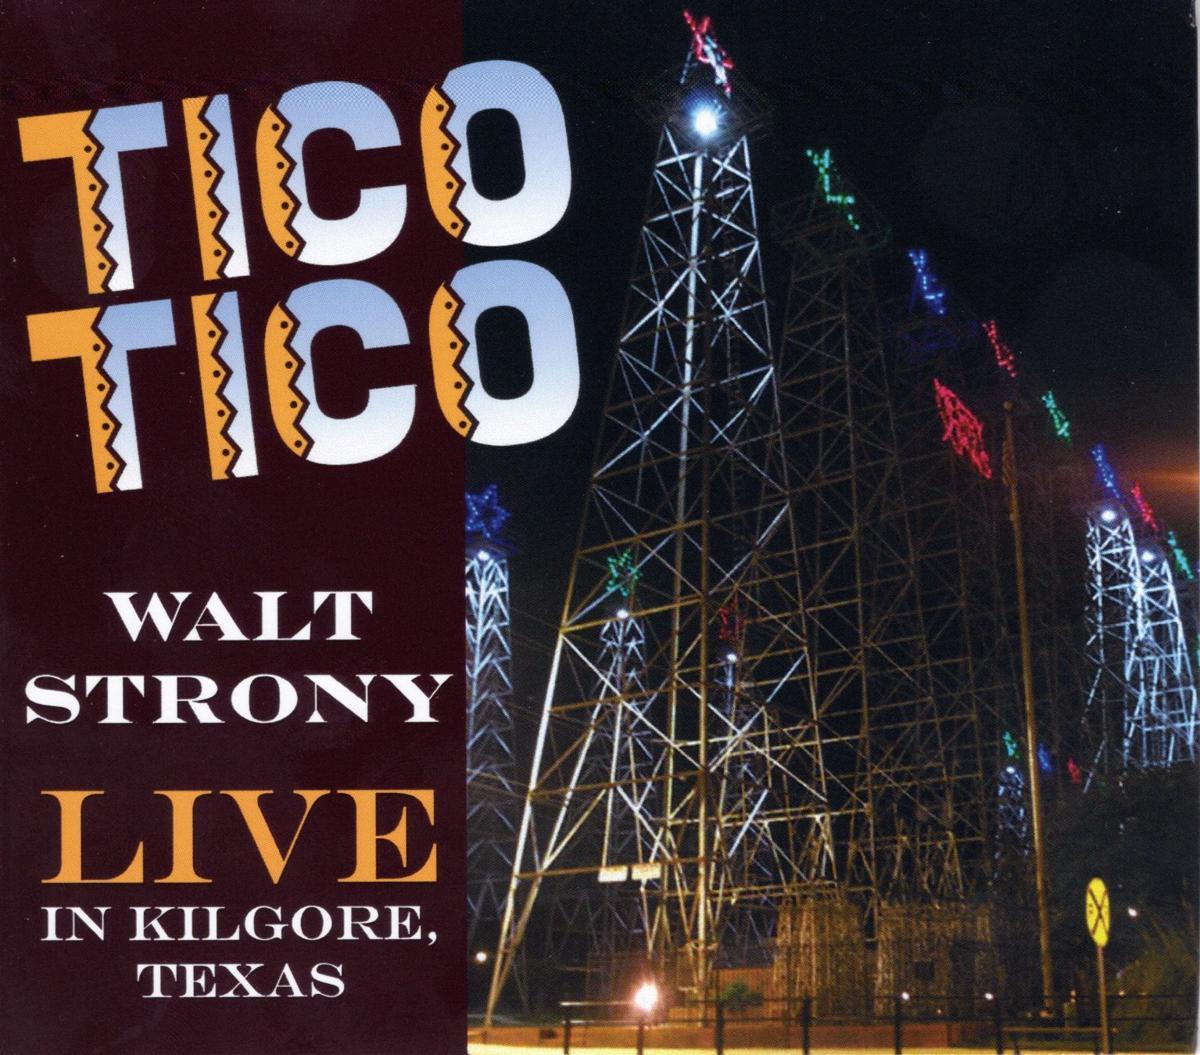 Walt Strony - Tico Tico CD Cover.jpg